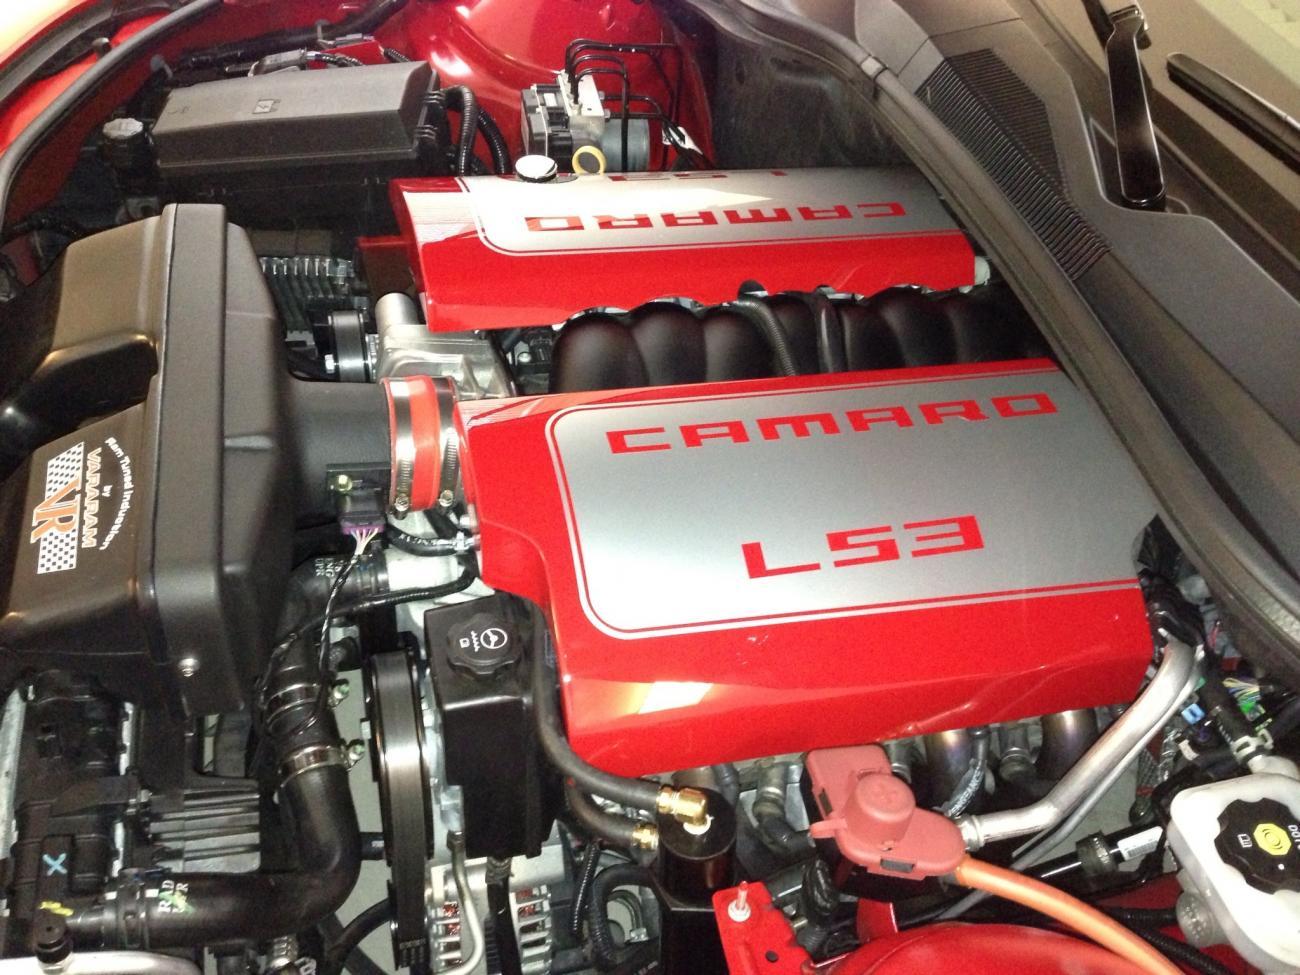 Ls3 Engine Cover Camaro5 Chevy Camaro Forum Camaro Zl1